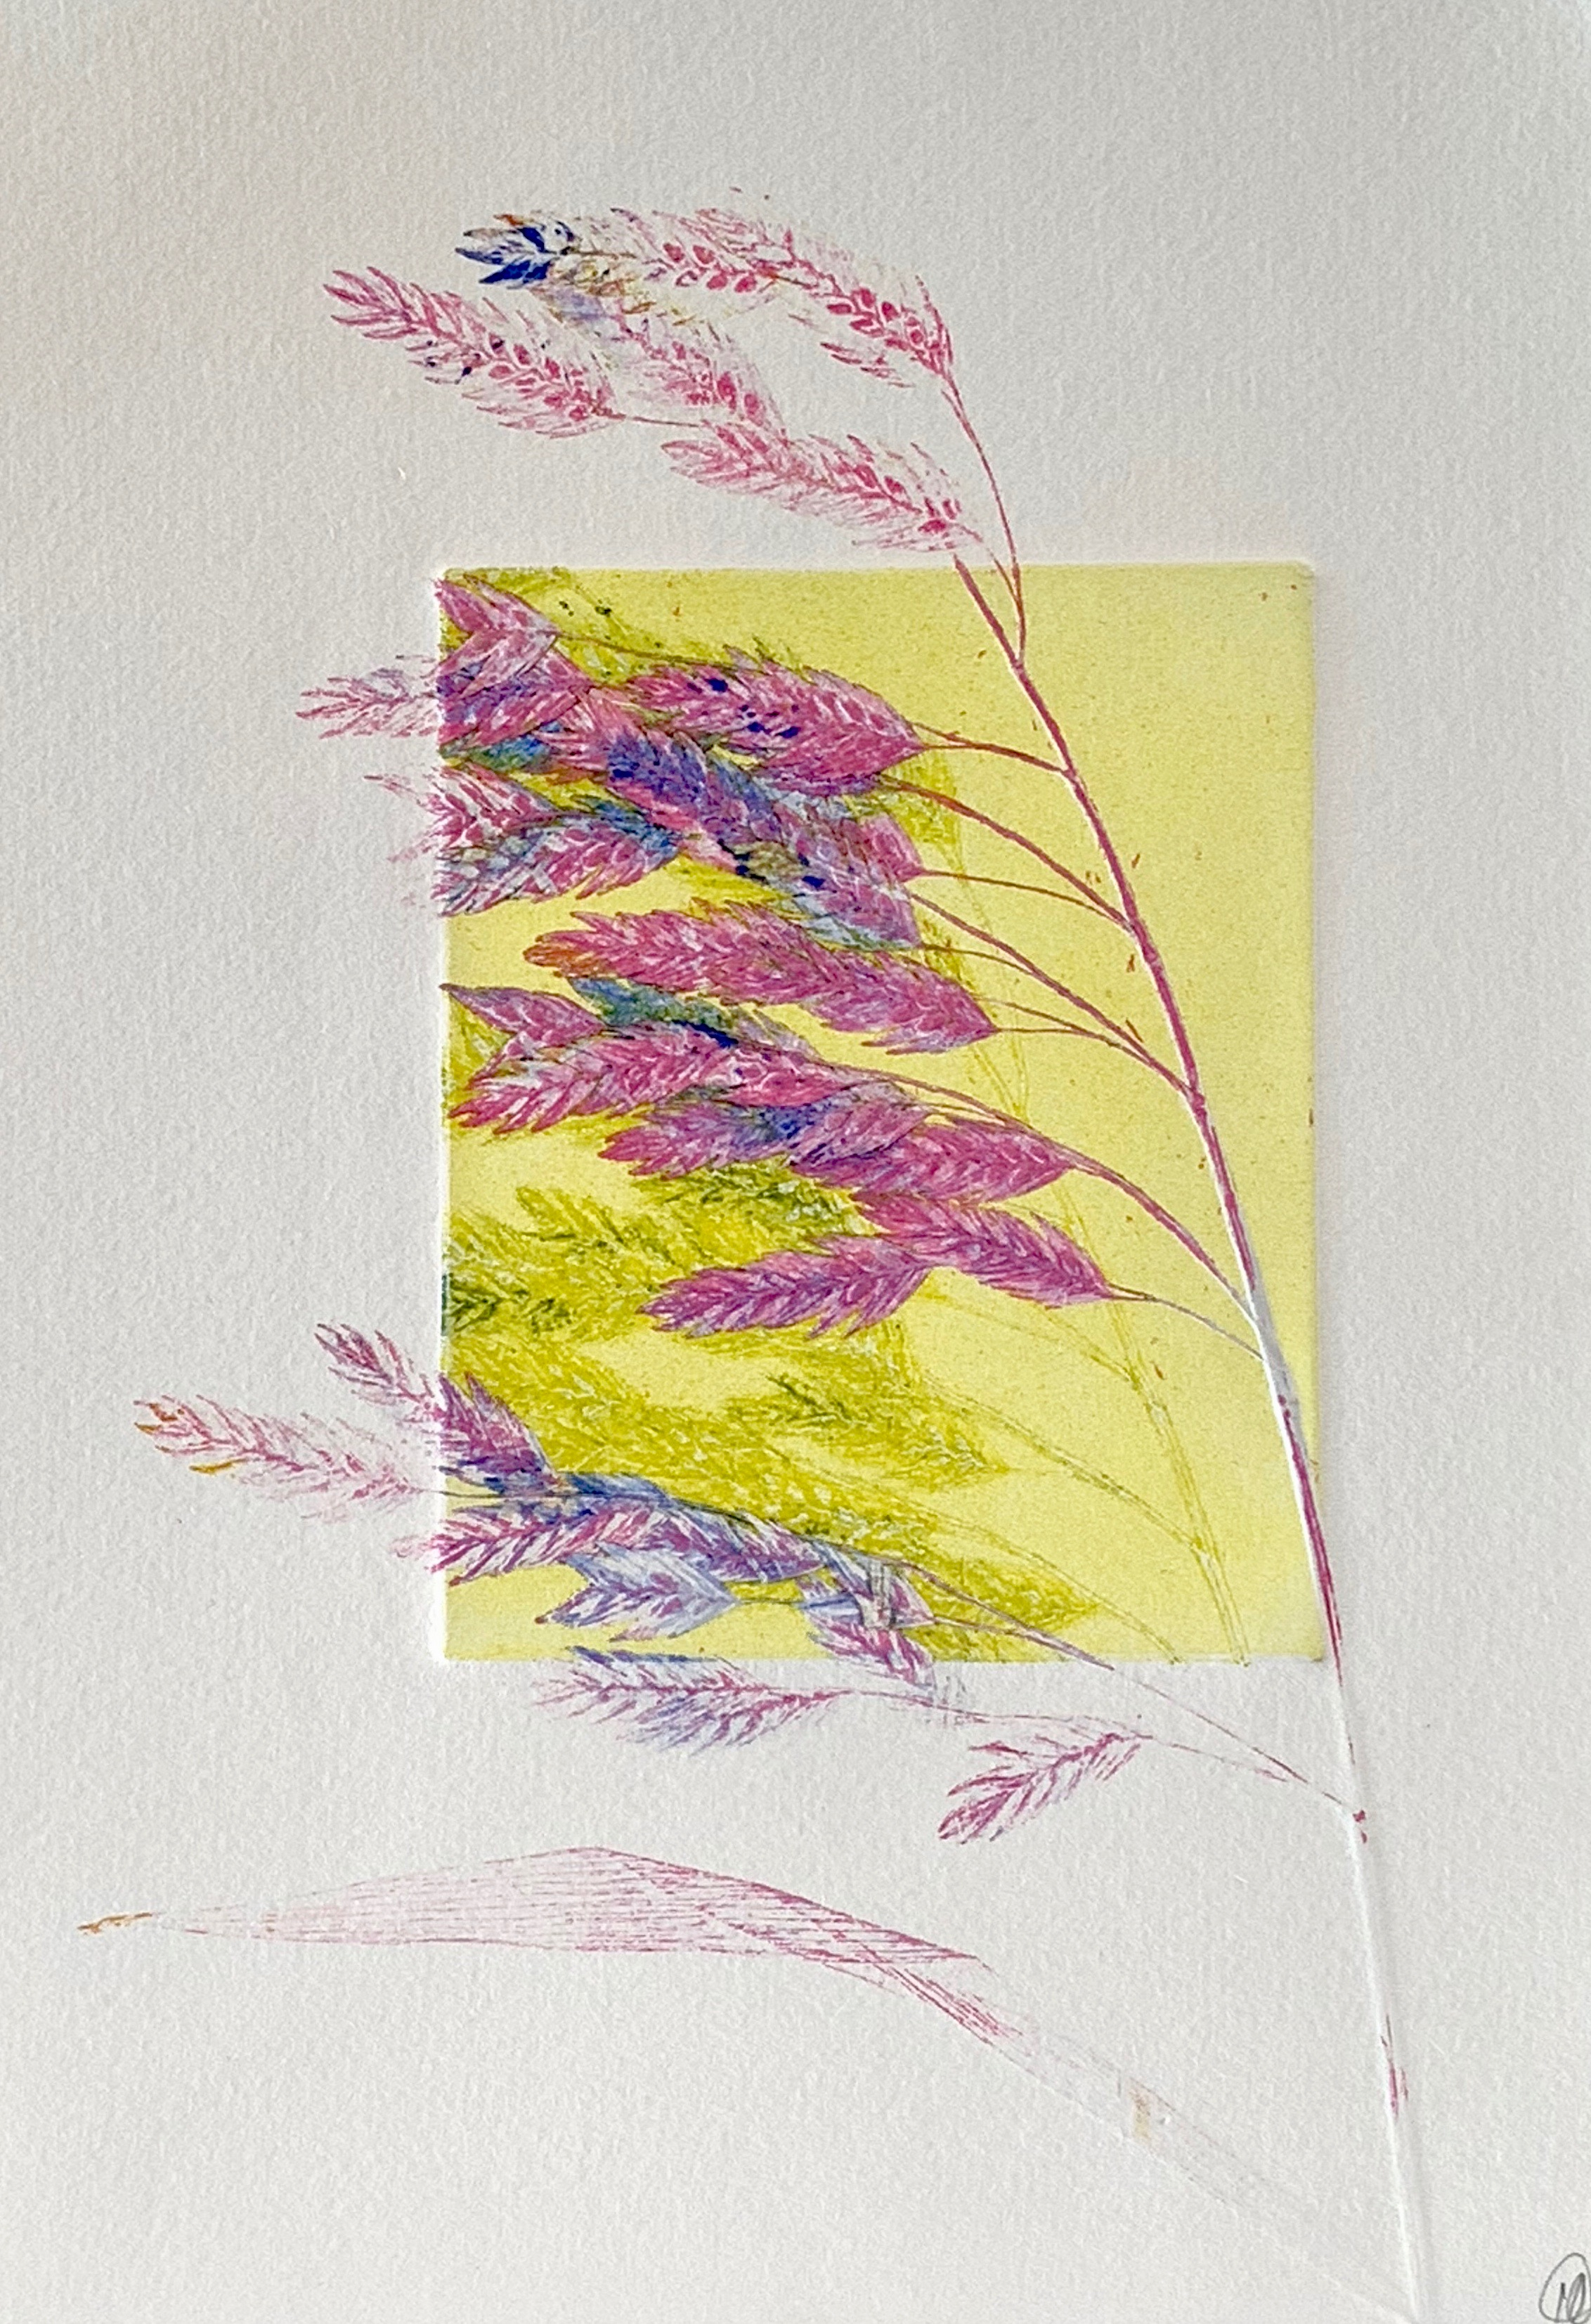 oats, tannin + ink on paper